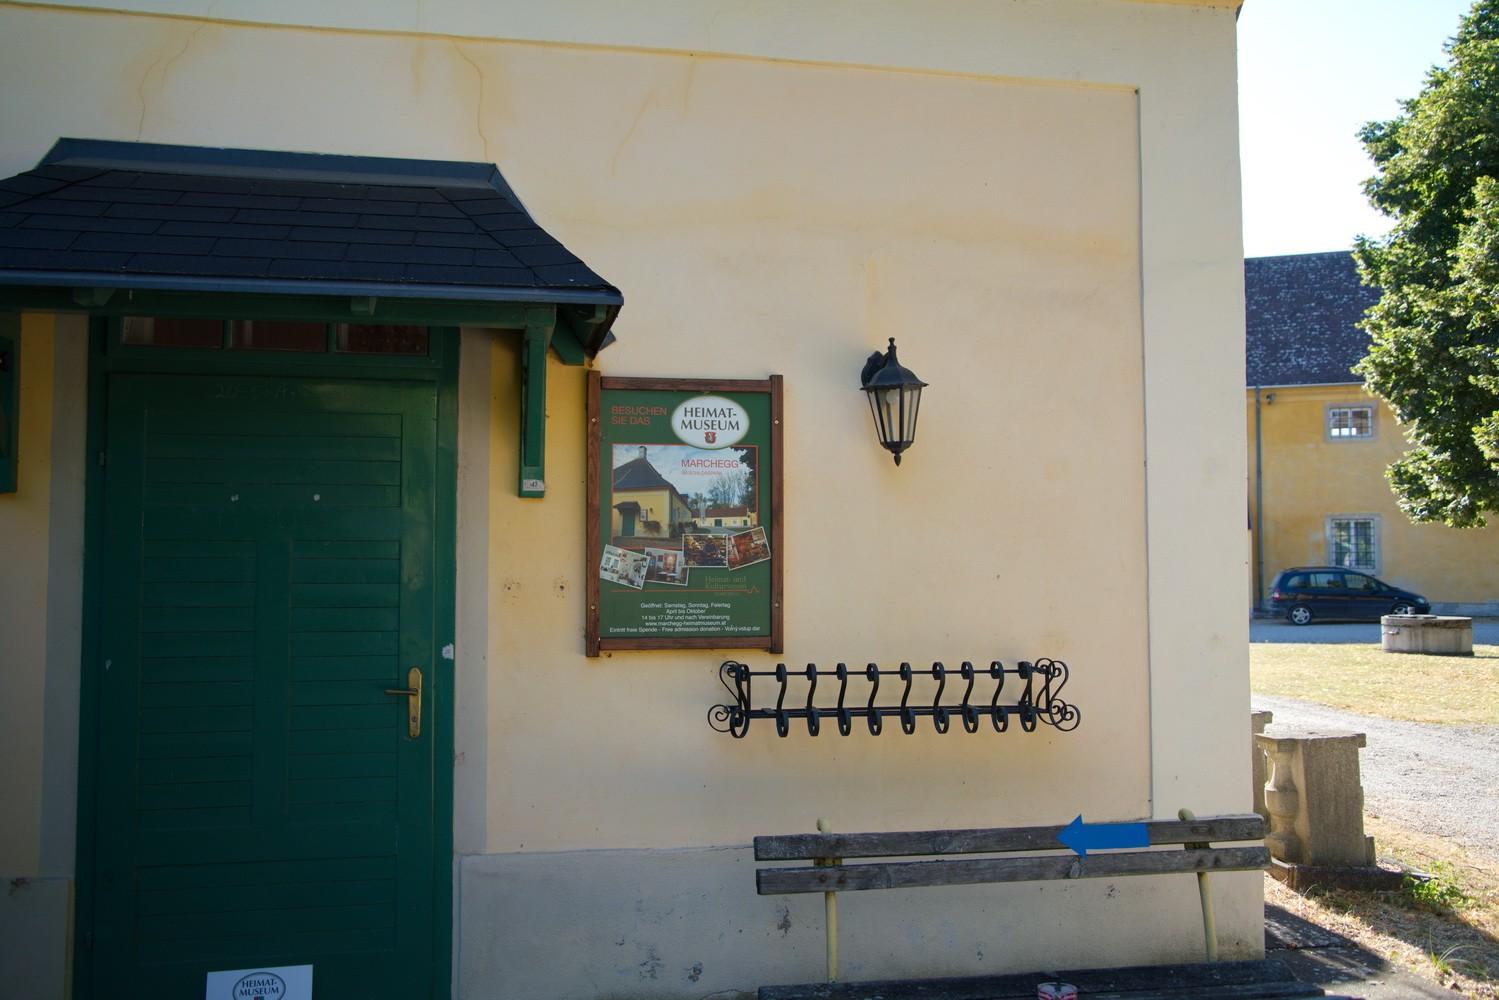 Katakombenheuriger in Schlossgarten